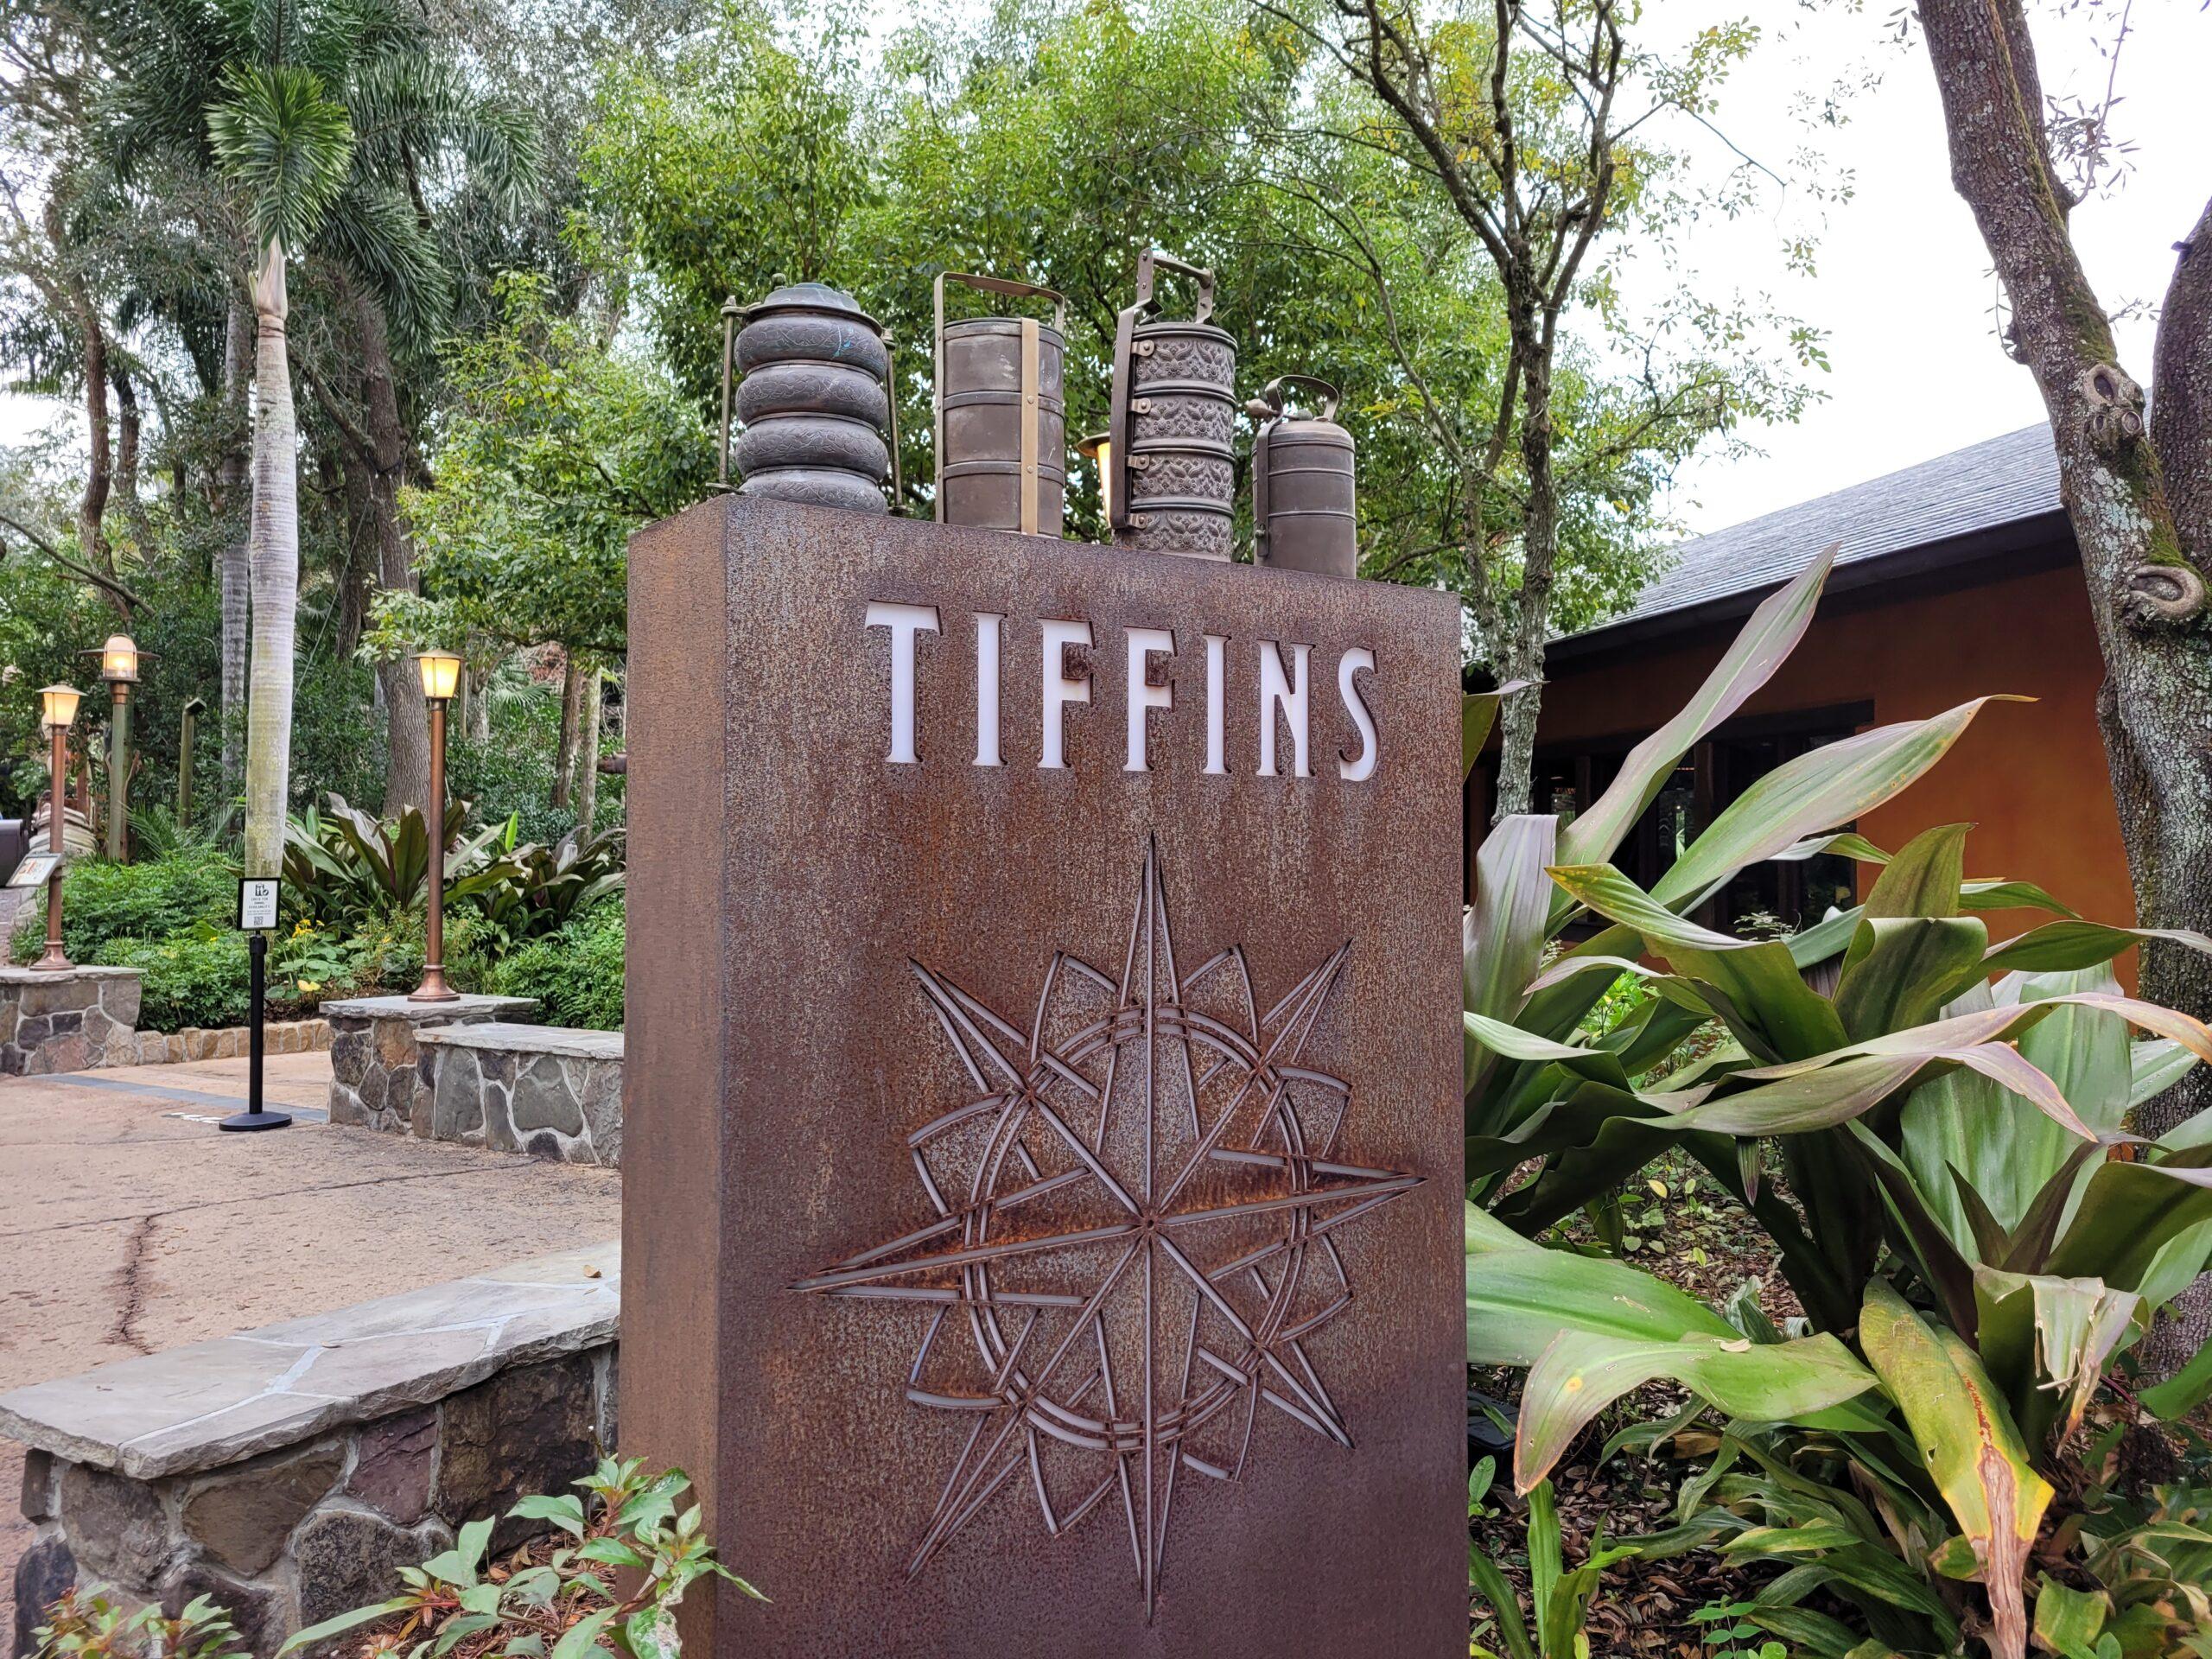 Tiffins Sign At Animal Kingdom